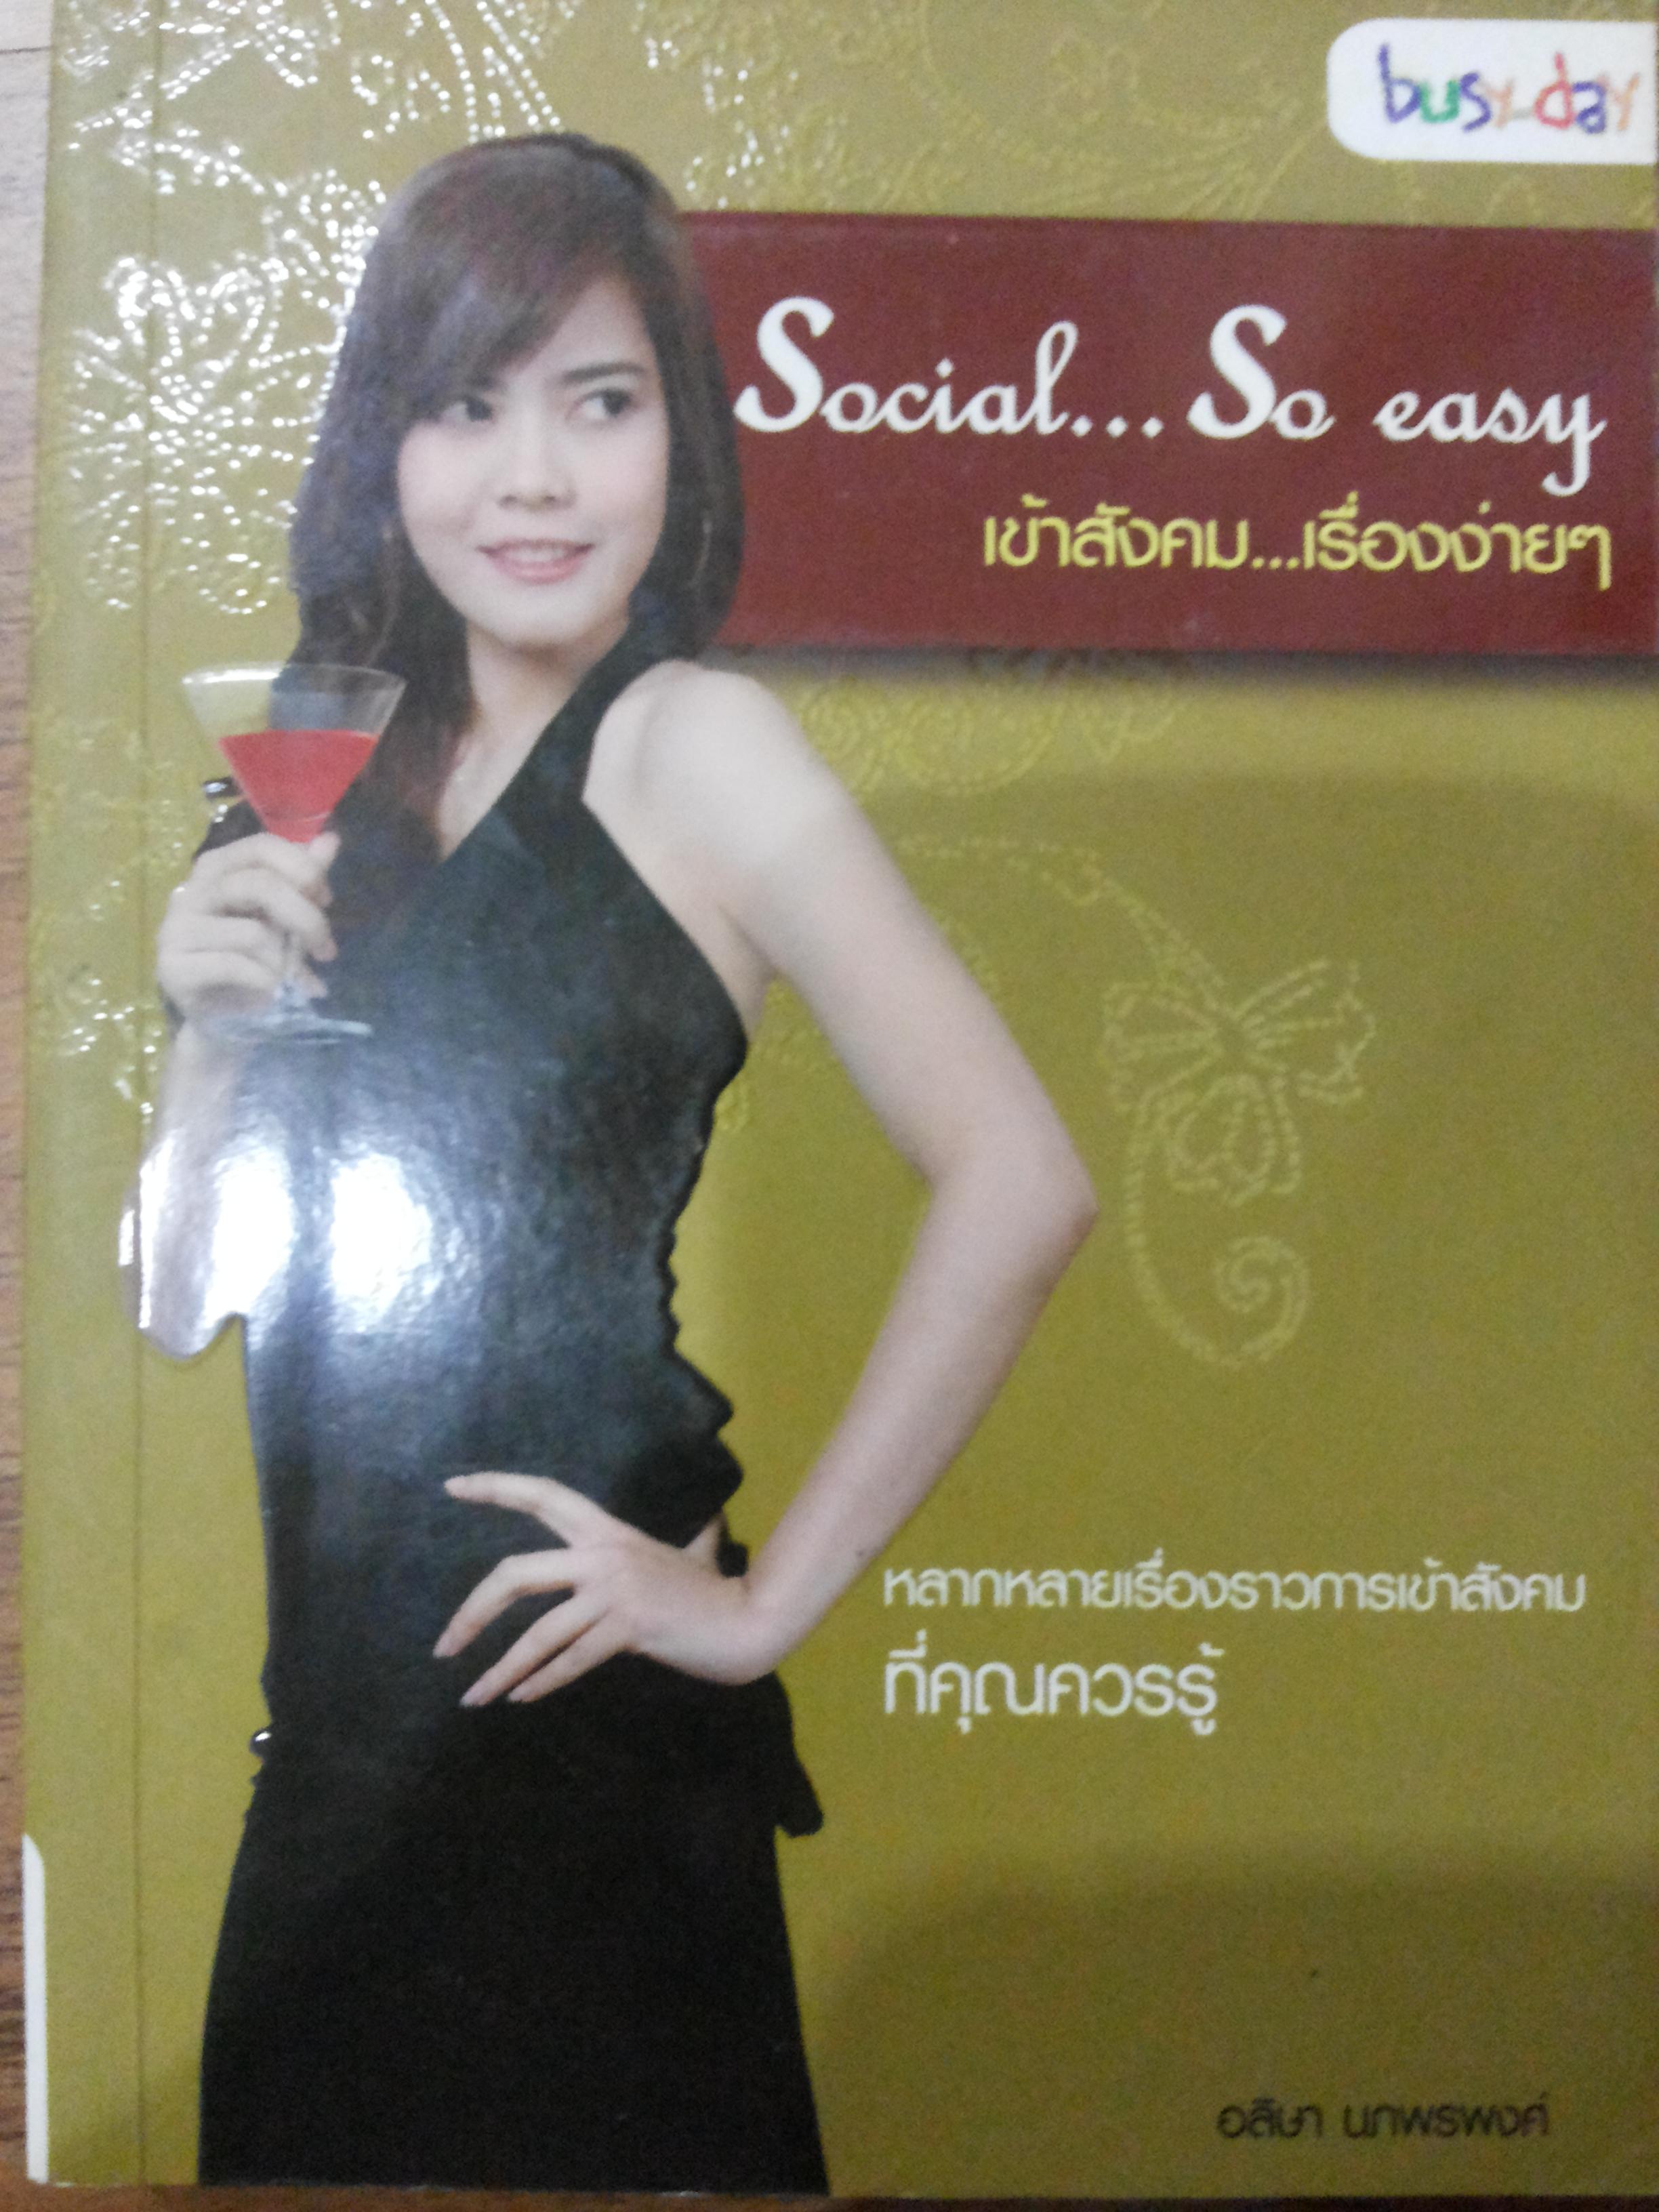 Social...So easy เข้าสังคม..เรื่องง่ายๆ